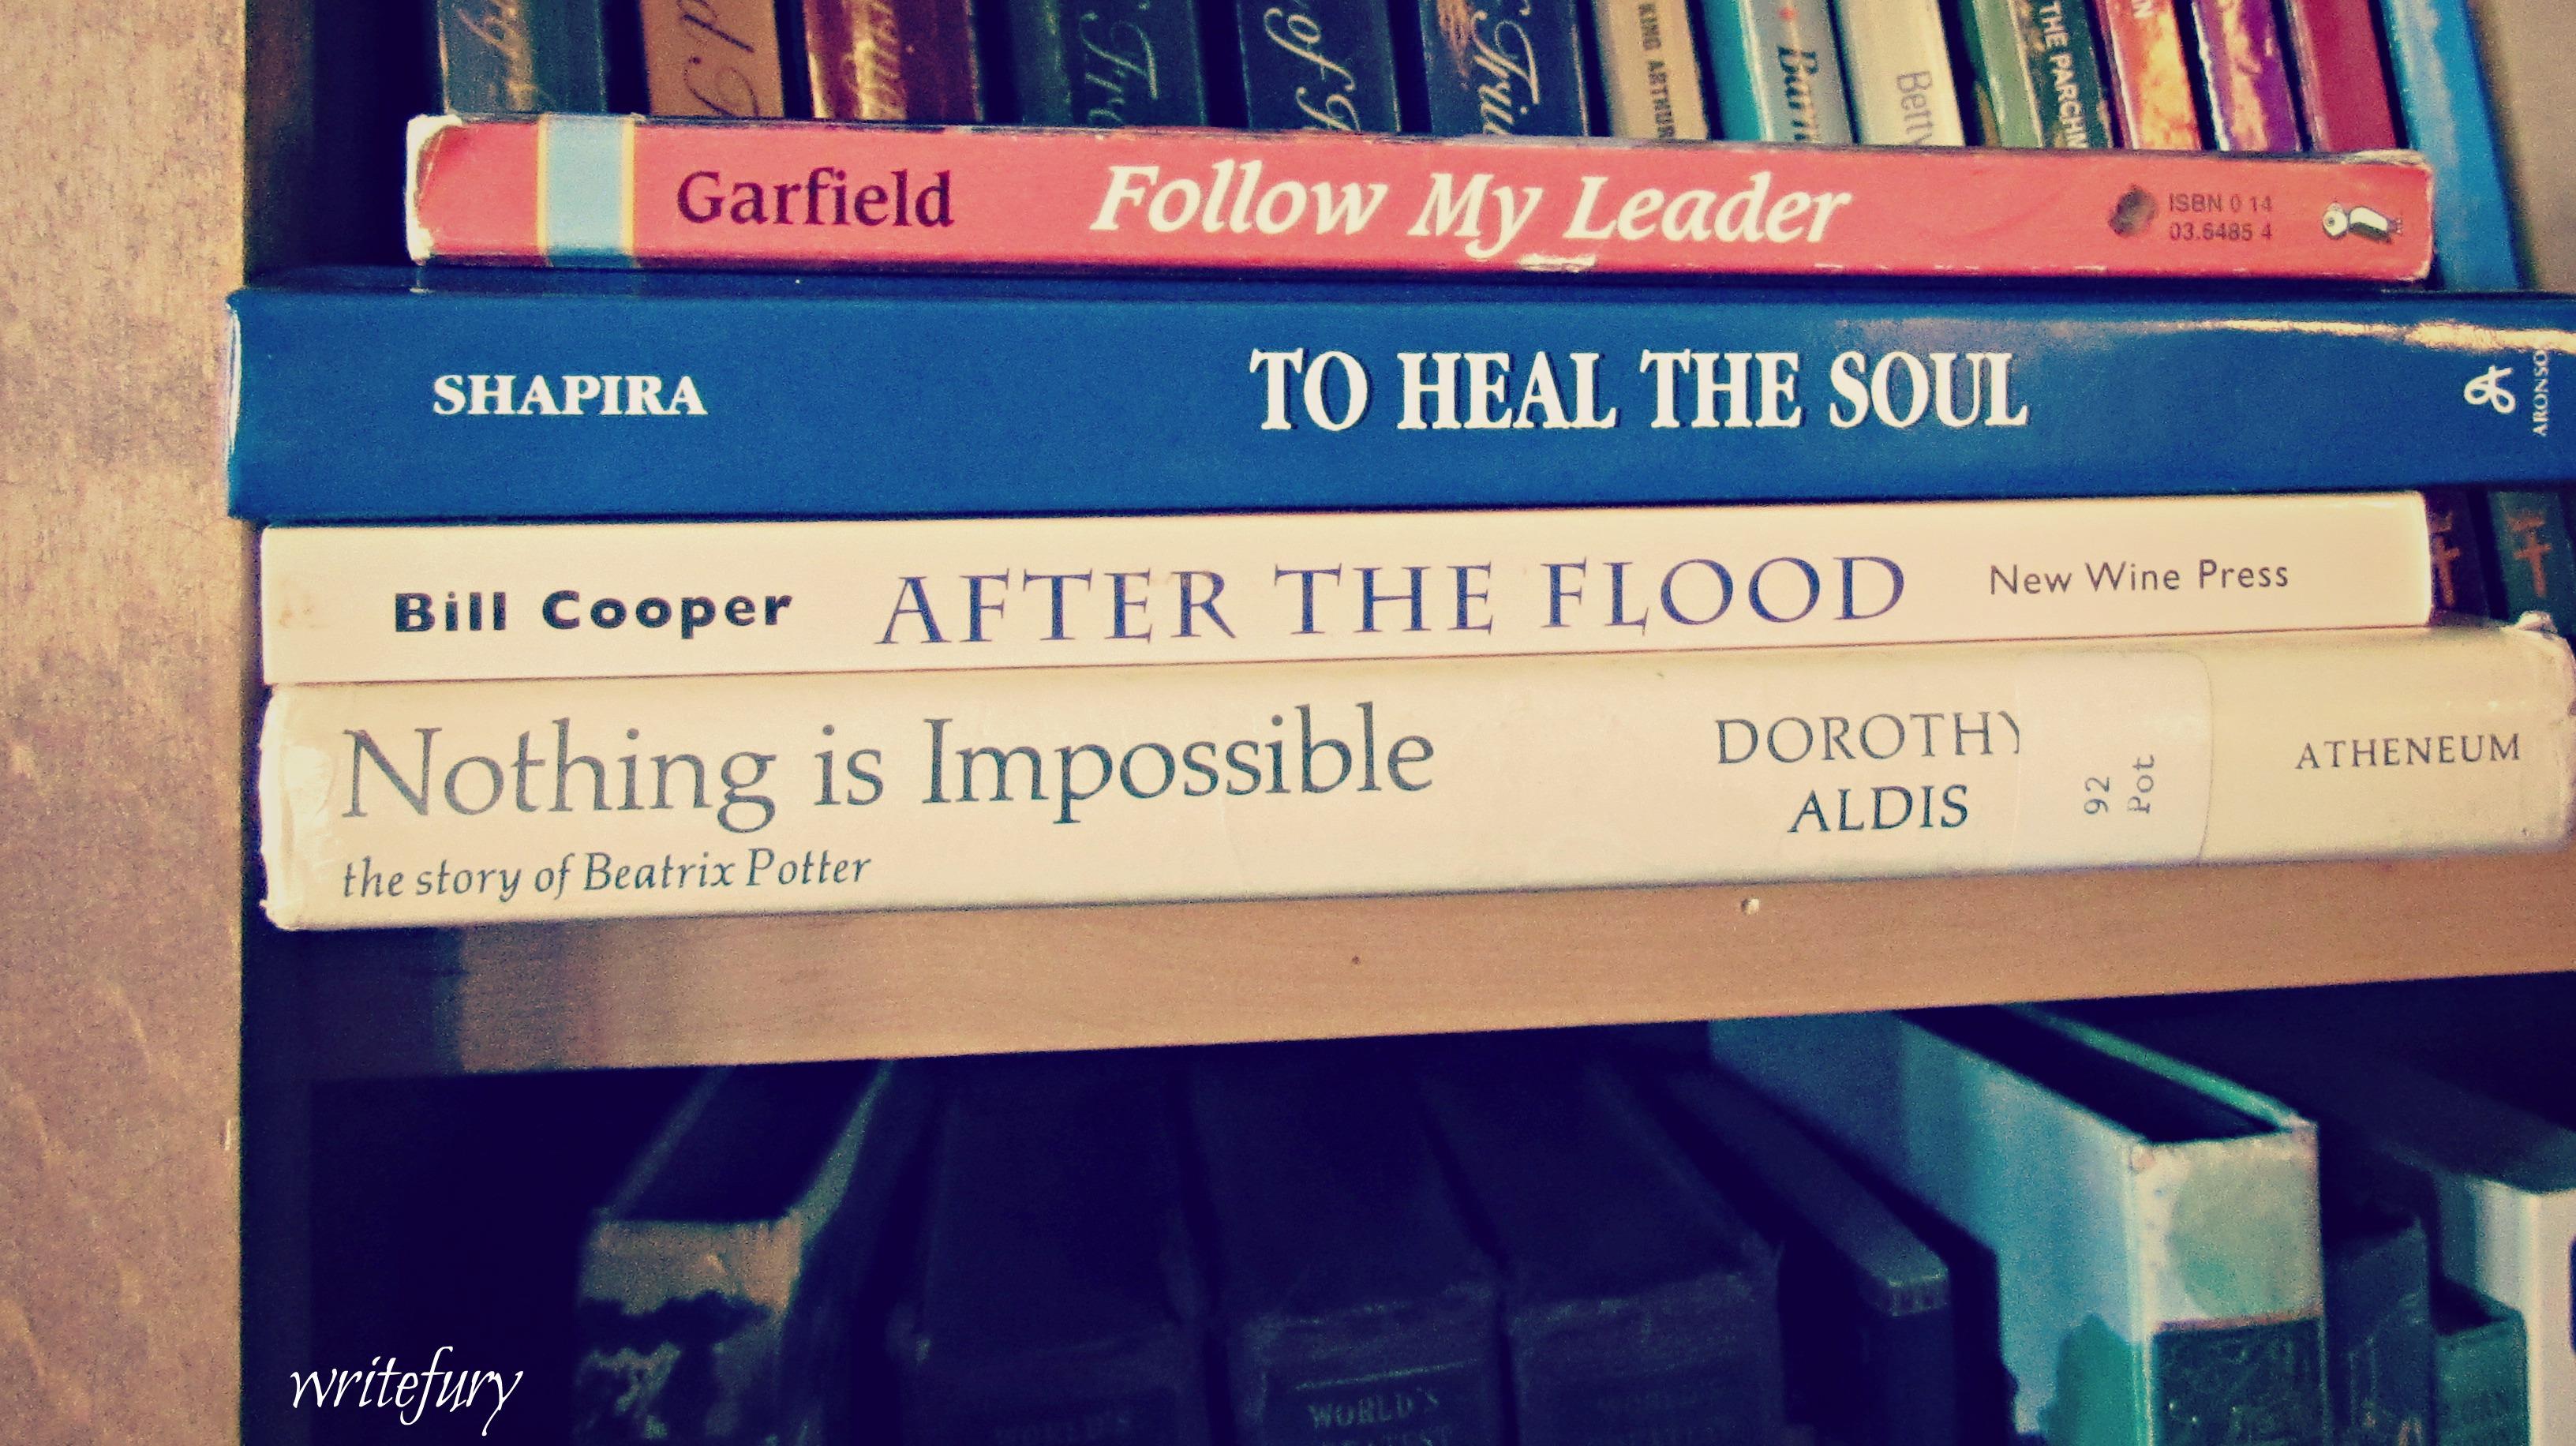 bookspine 1